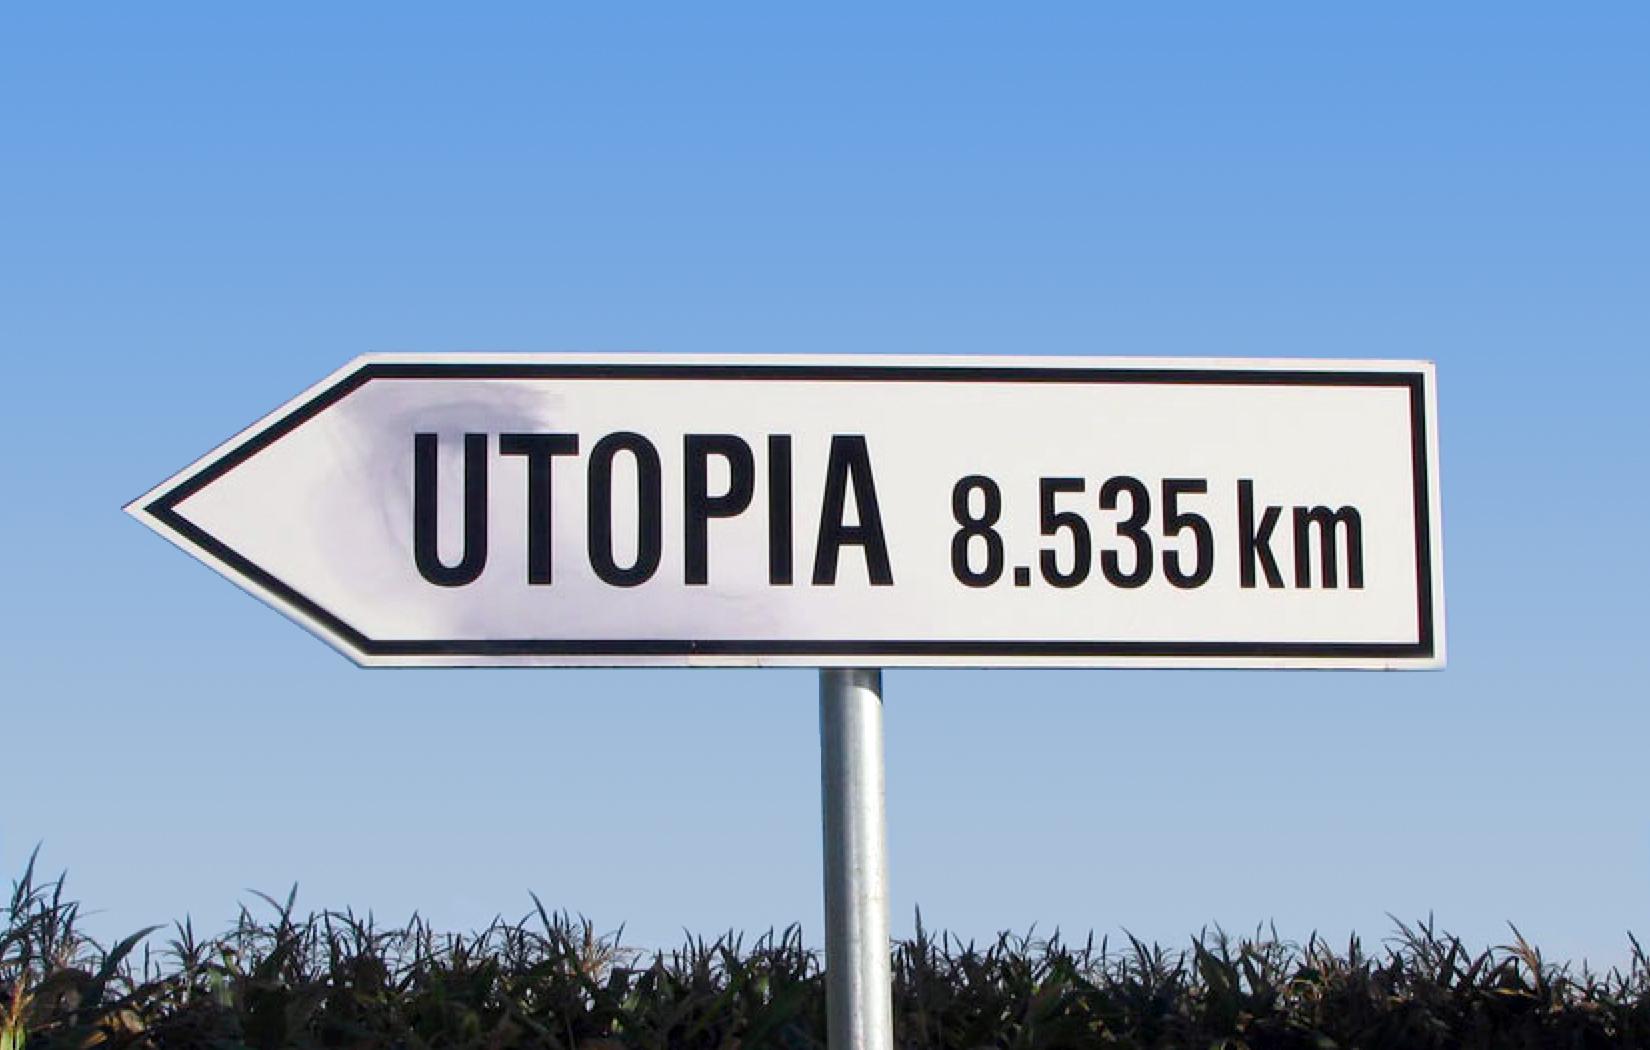 ed-rene-kivitz-fe-lagrimas-e-utopia